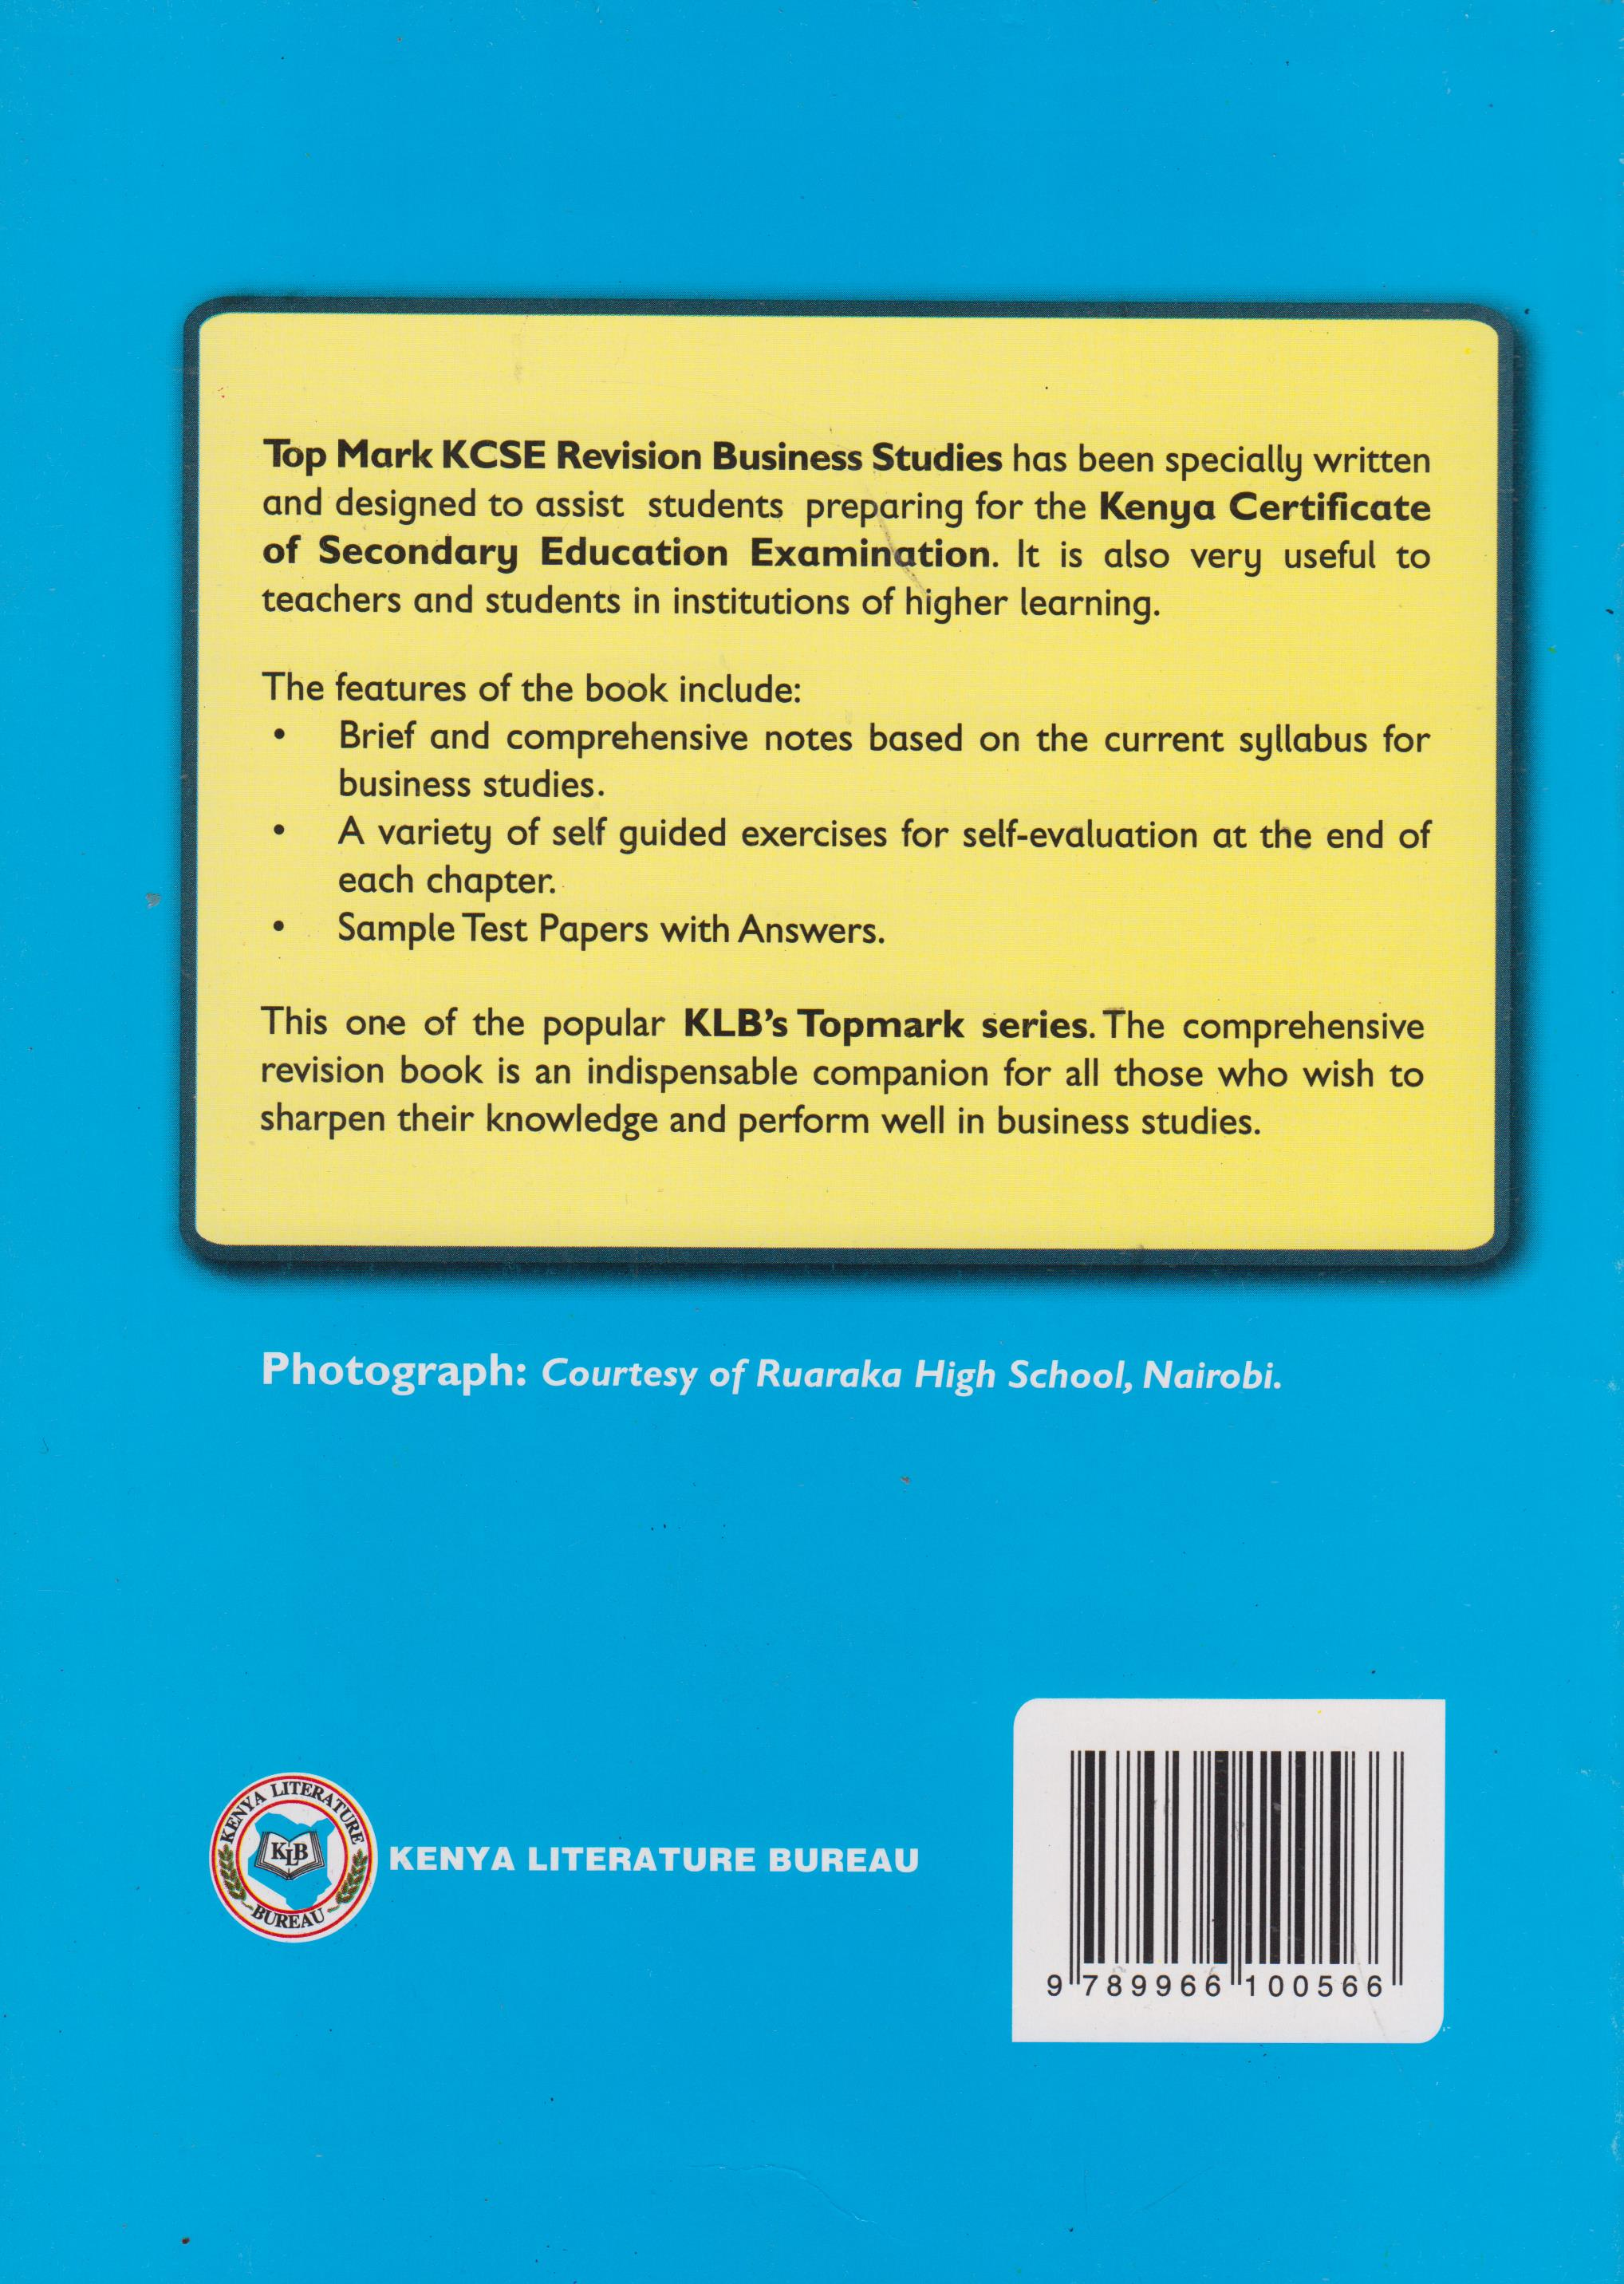 Topmark KCSE Revision Business Studies